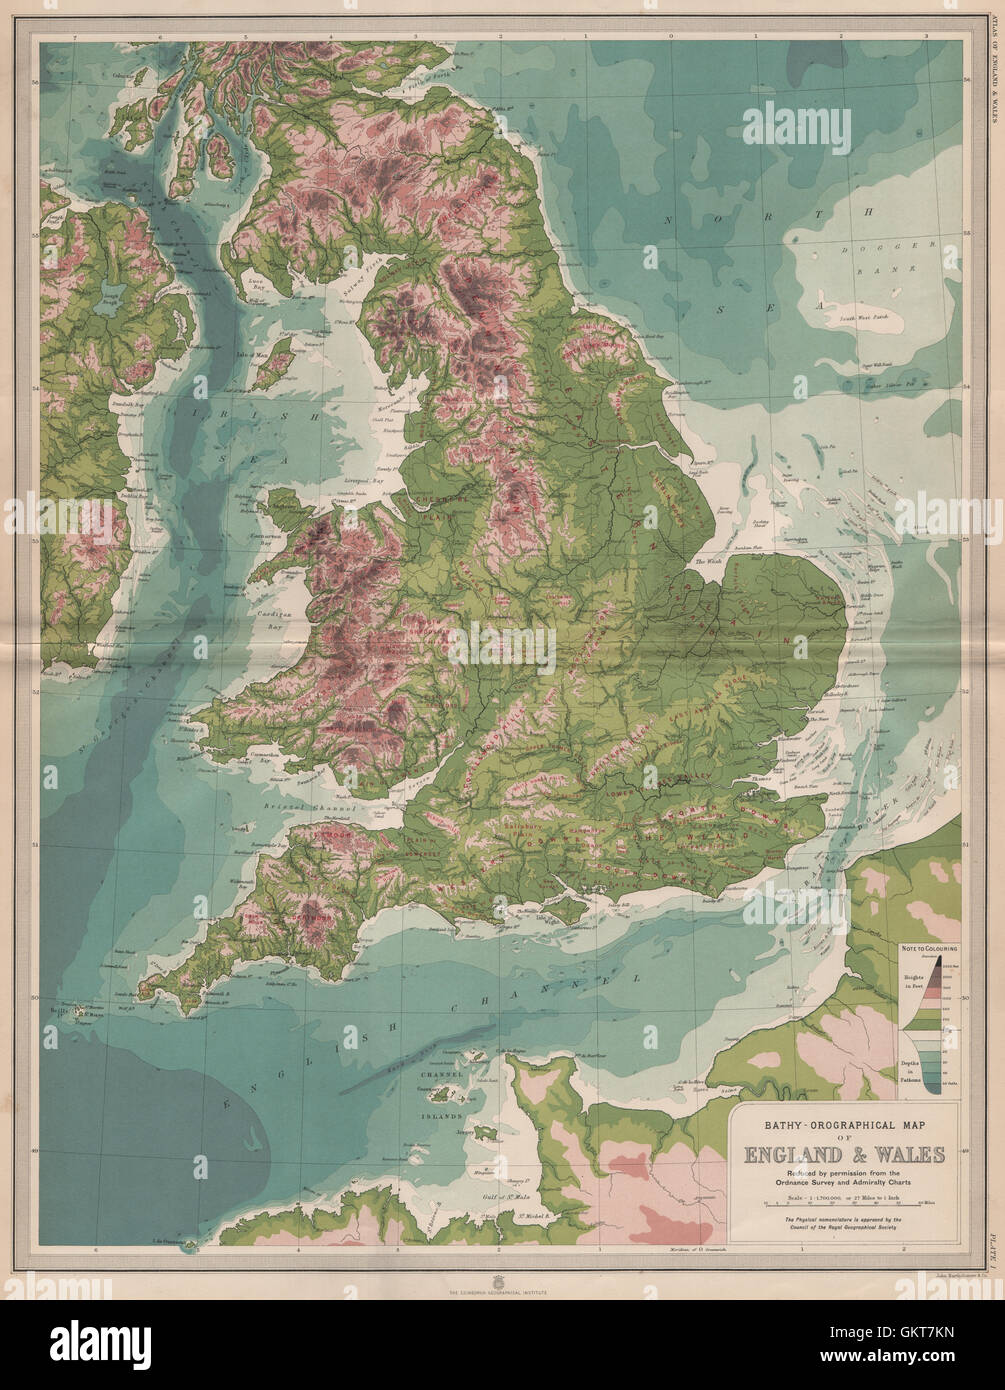 Inghilterra Fisica Cartina.Inghilterra E Galles Cartina Fisica Grande Bartolomeo 1903 Foto Stock Alamy